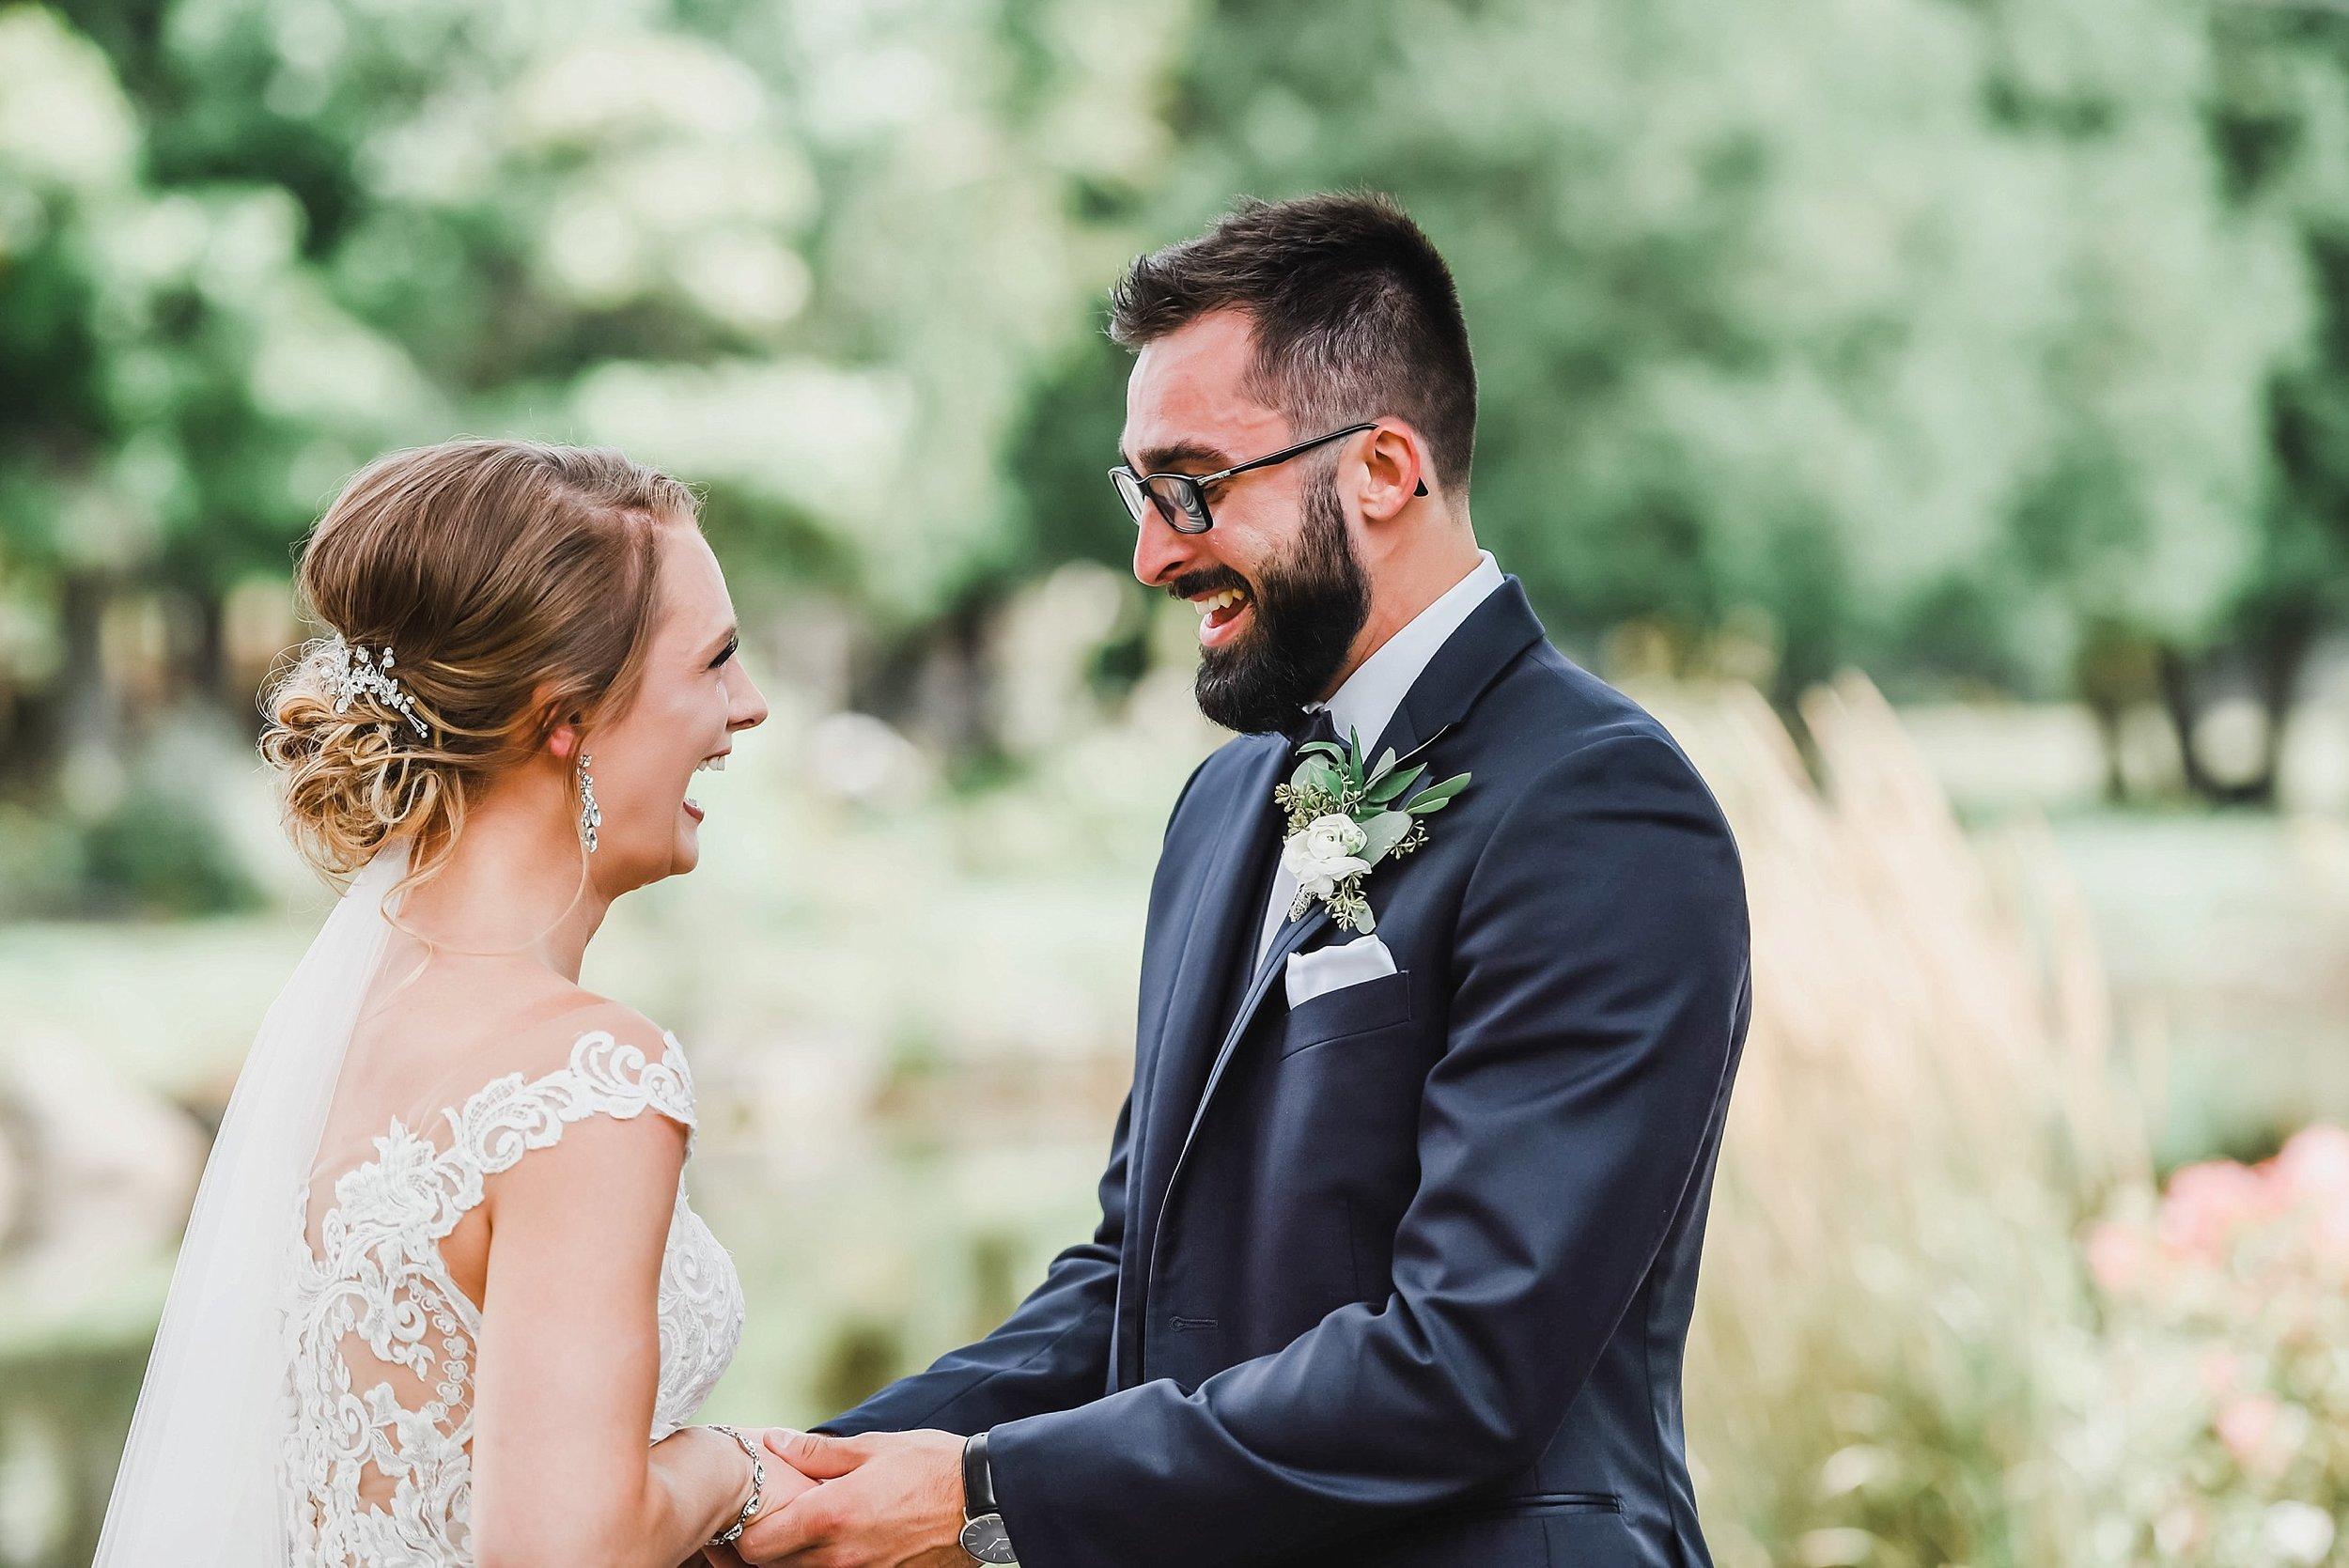 light airy indie fine art ottawa wedding photographer | Ali and Batoul Photography_1243.jpg